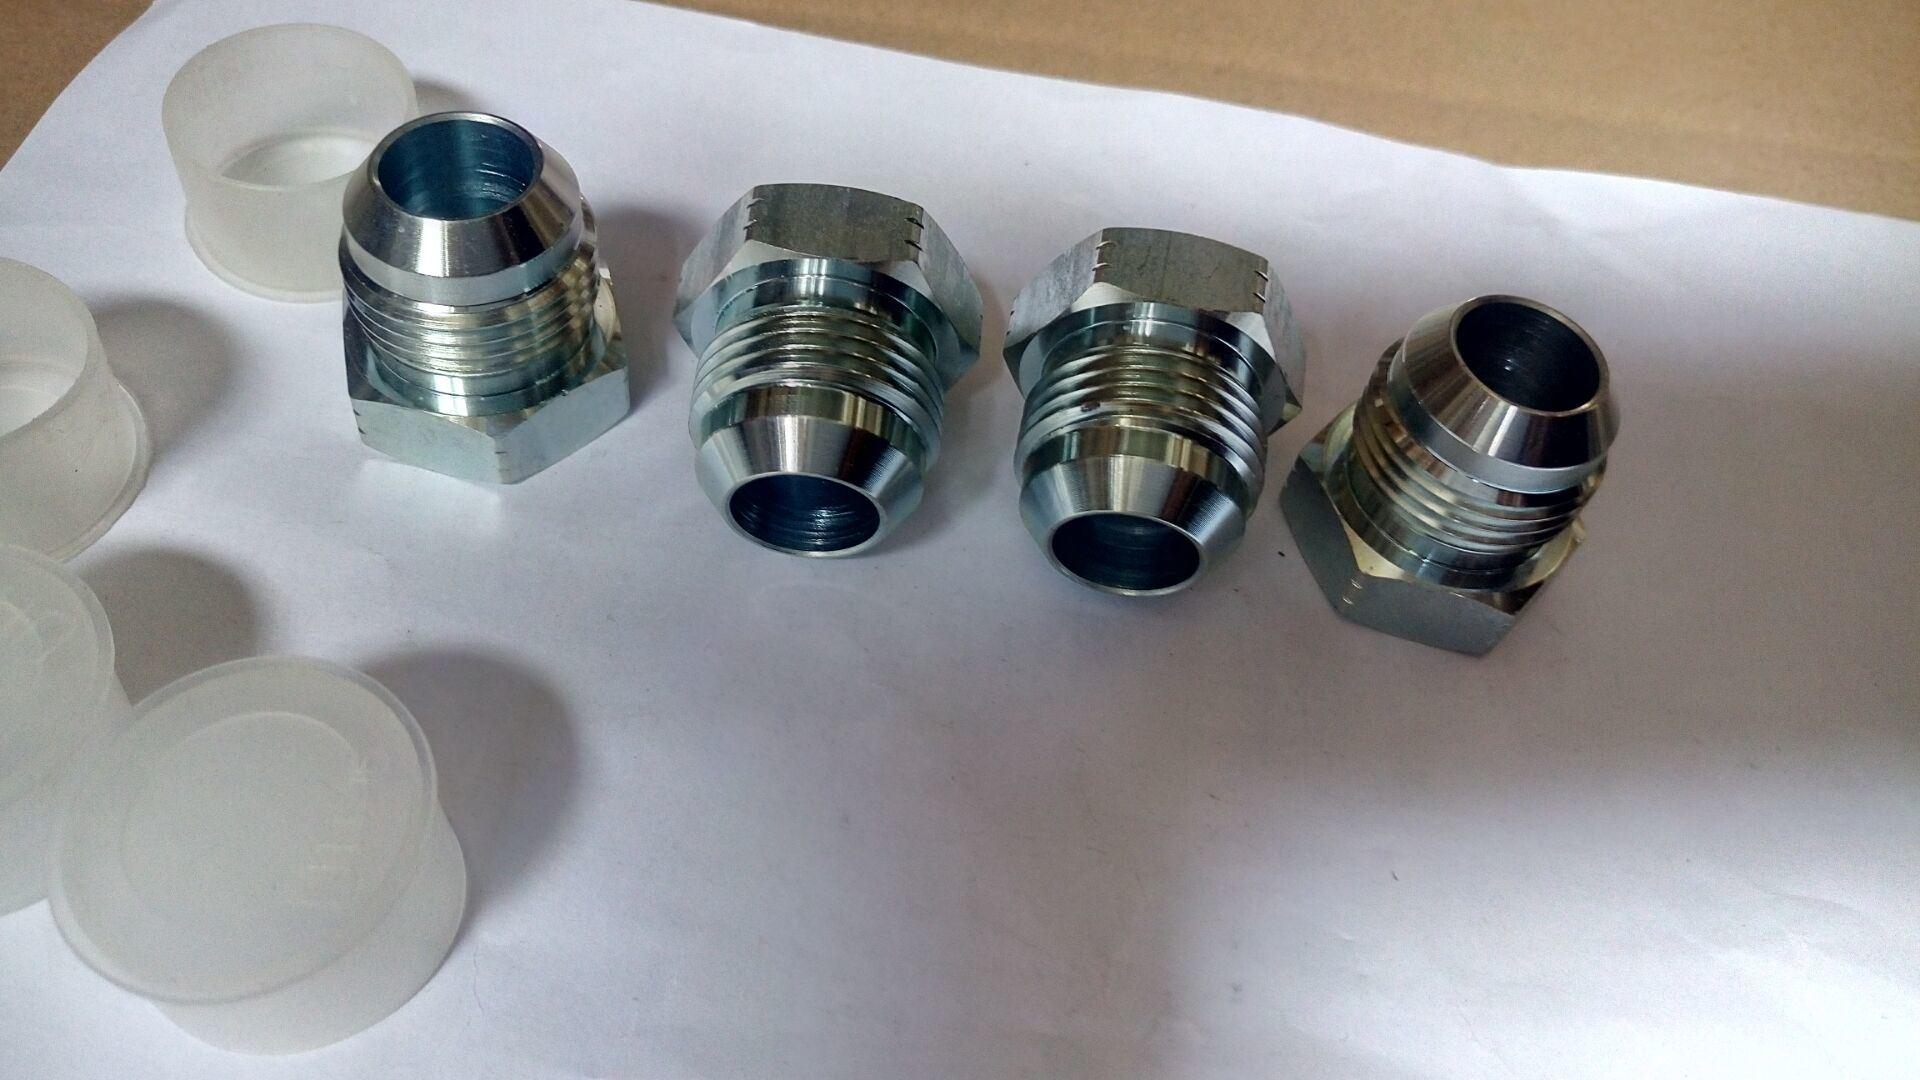 Qingdao Bsp Male Hydraulic Hose Fitting / Adapter (1B)